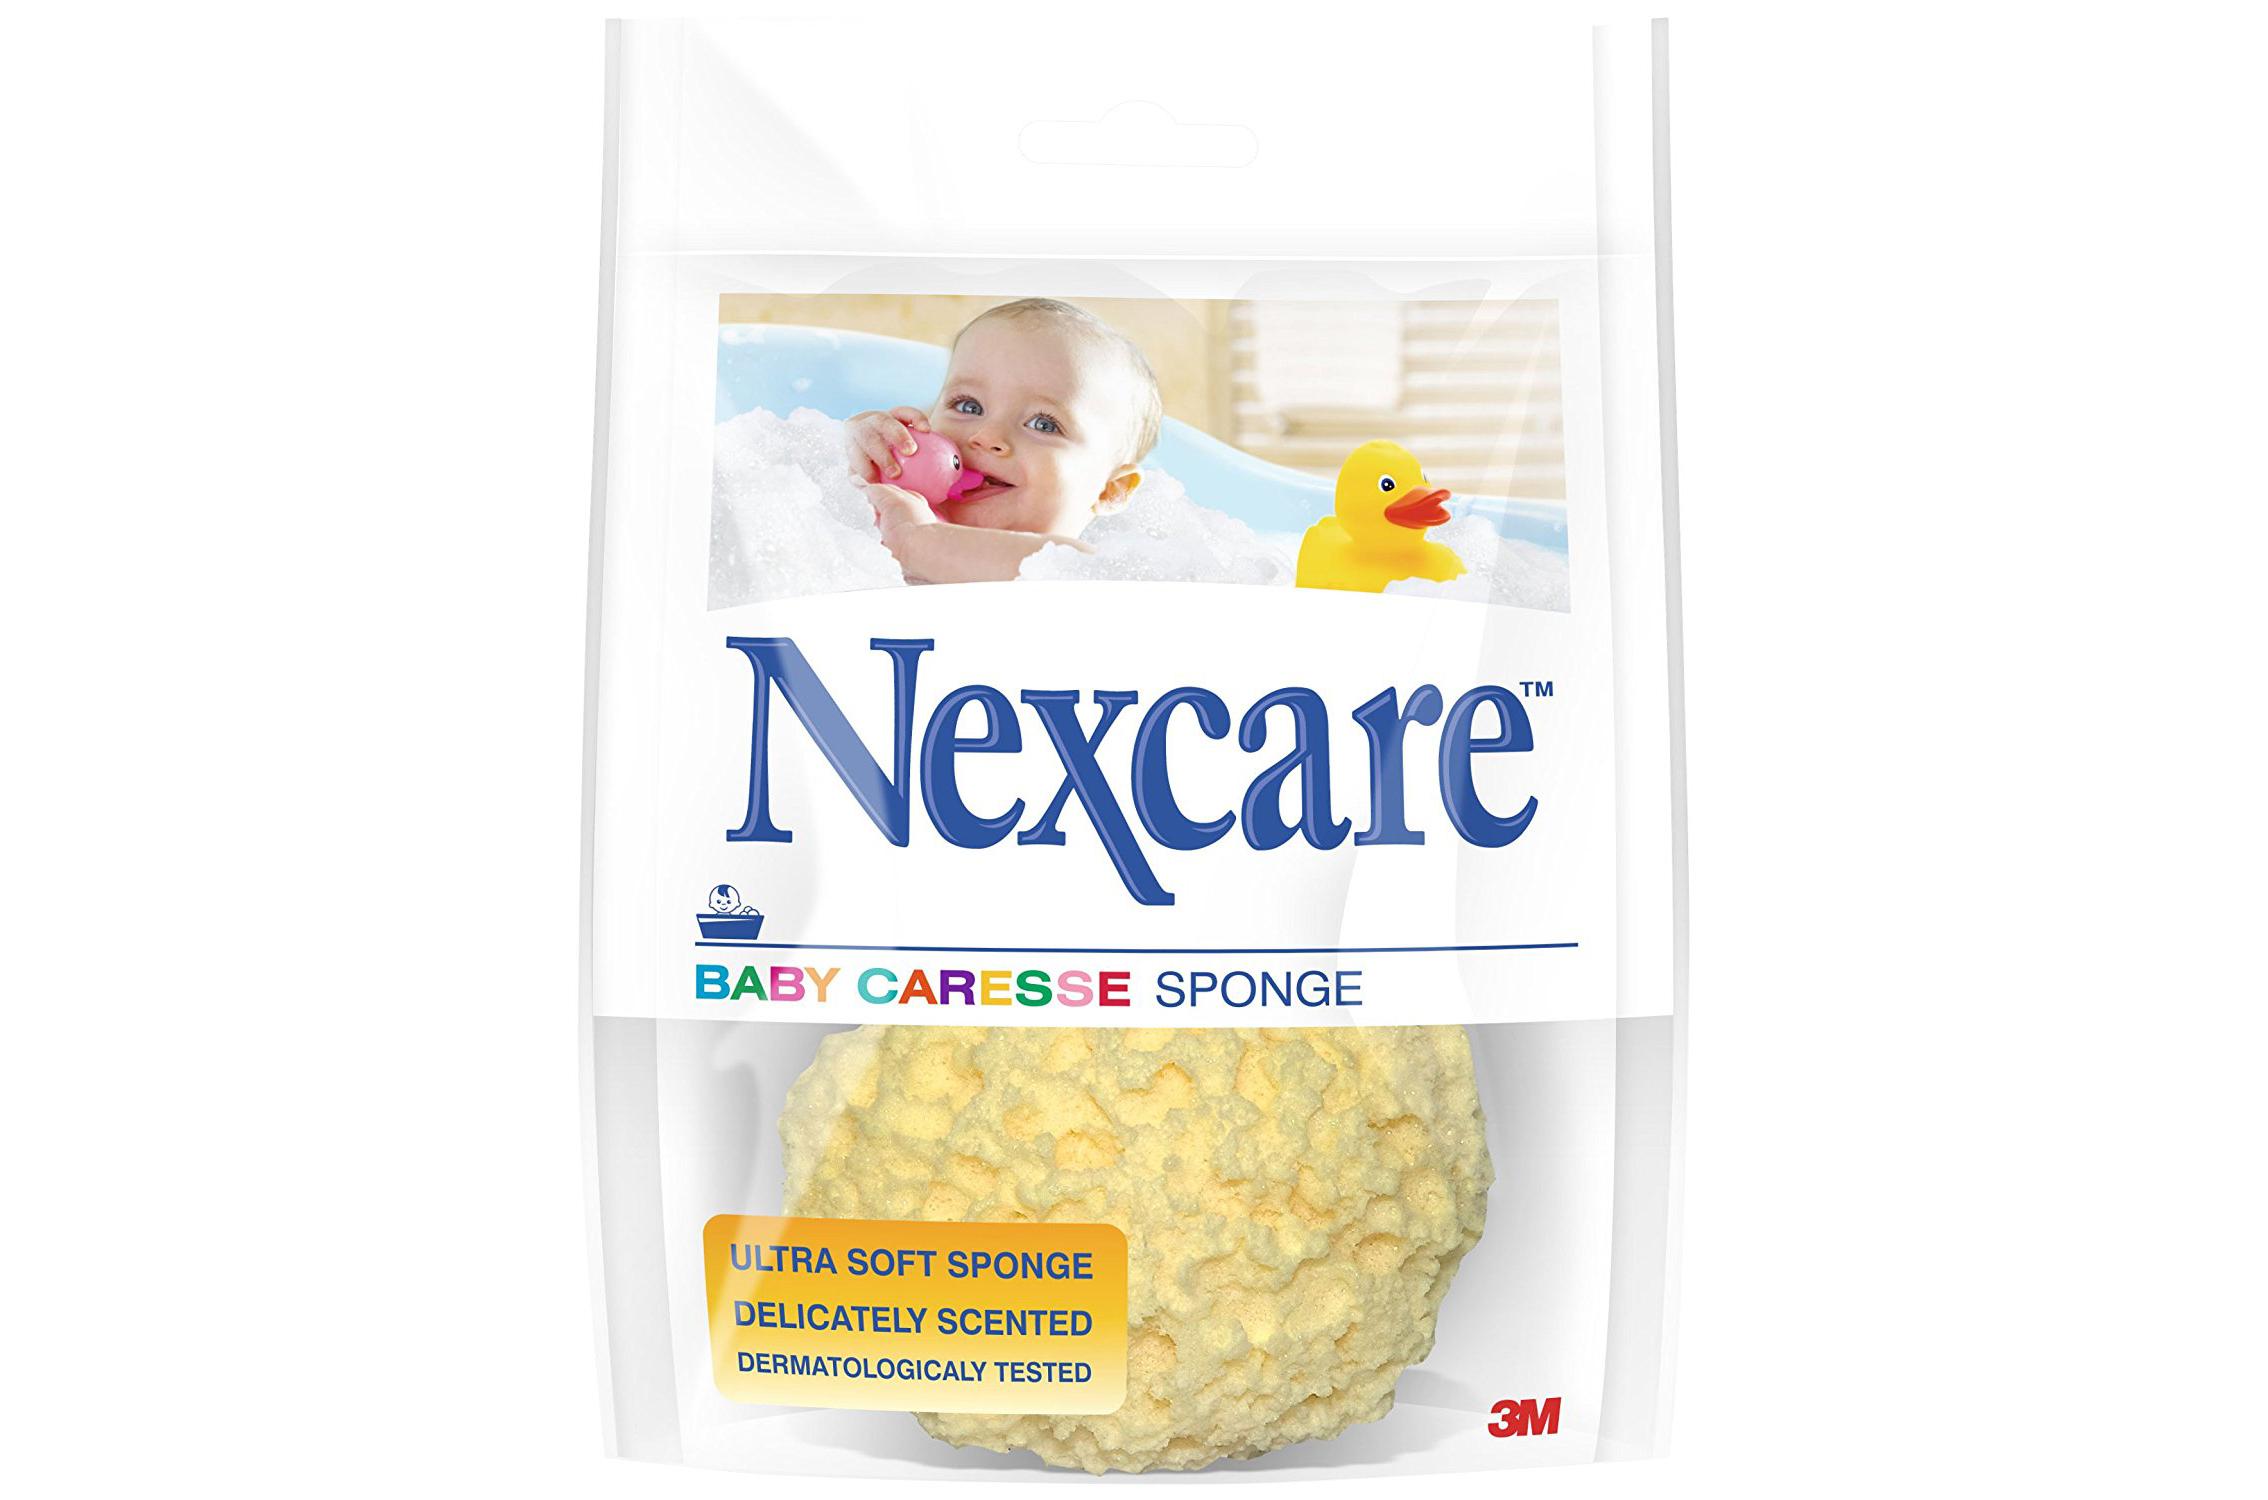 Nexcare KA999428630 NBC DFI Baby Sponge Caresse